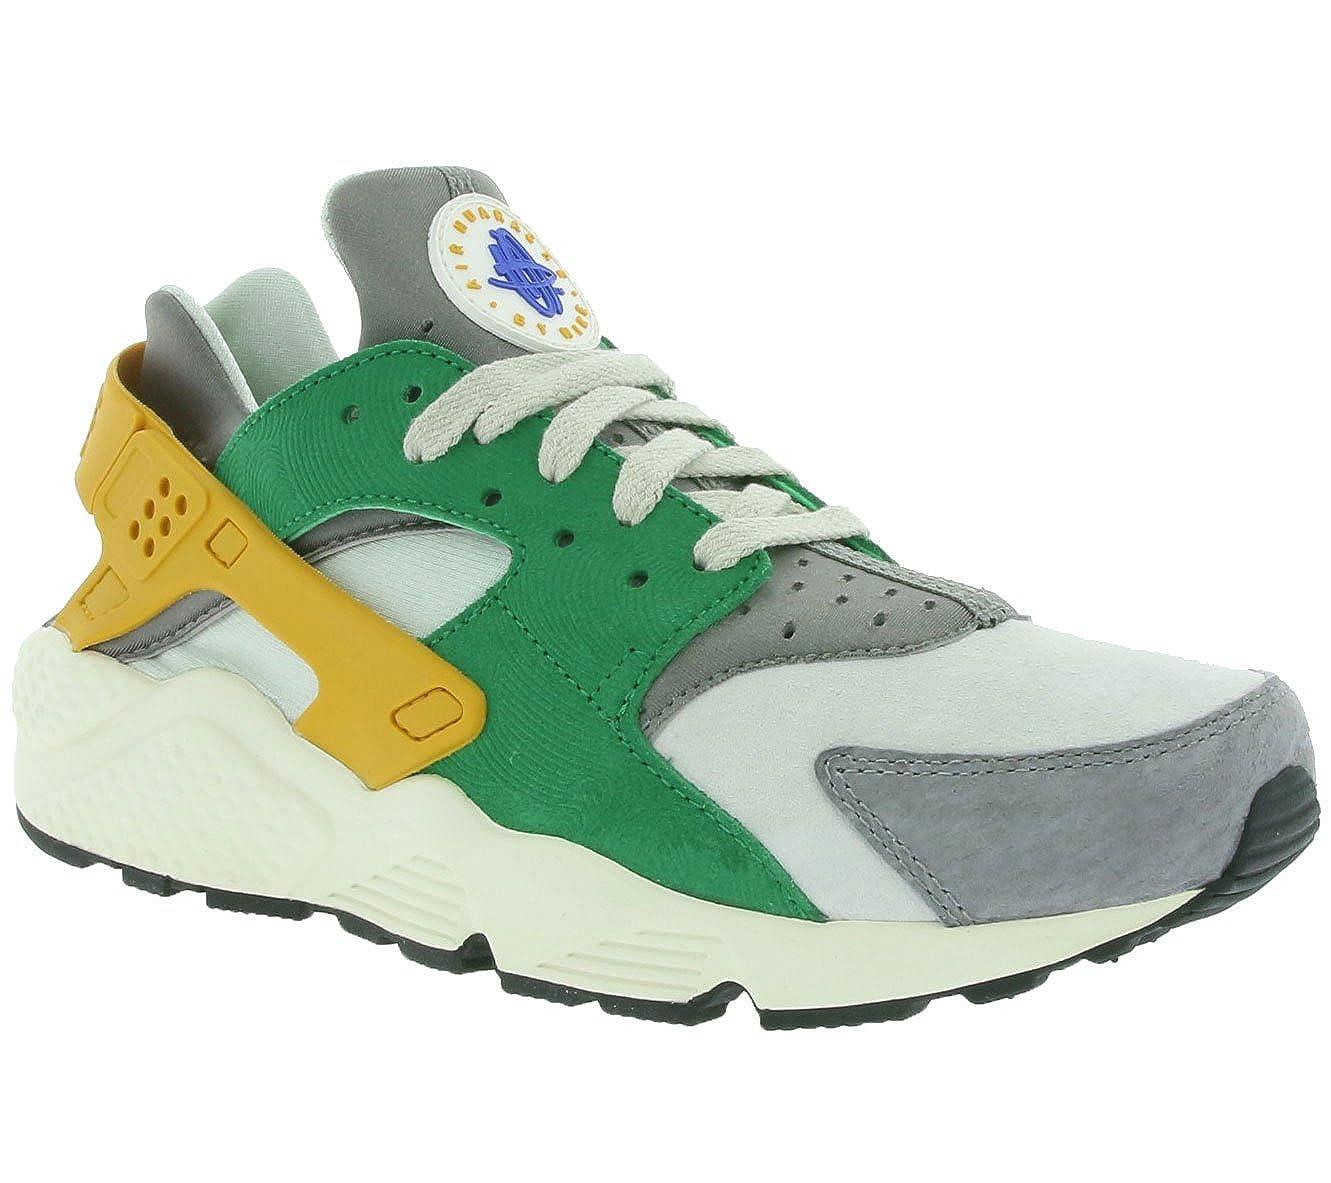 detailing a8f87 b7558 Nike 852628-300, Zapatillas de Trail Running para Hombre, Verde (Pine GreenGold  Leaf-Light Bone), 43 EU Amazon.es Zapatos y complementos